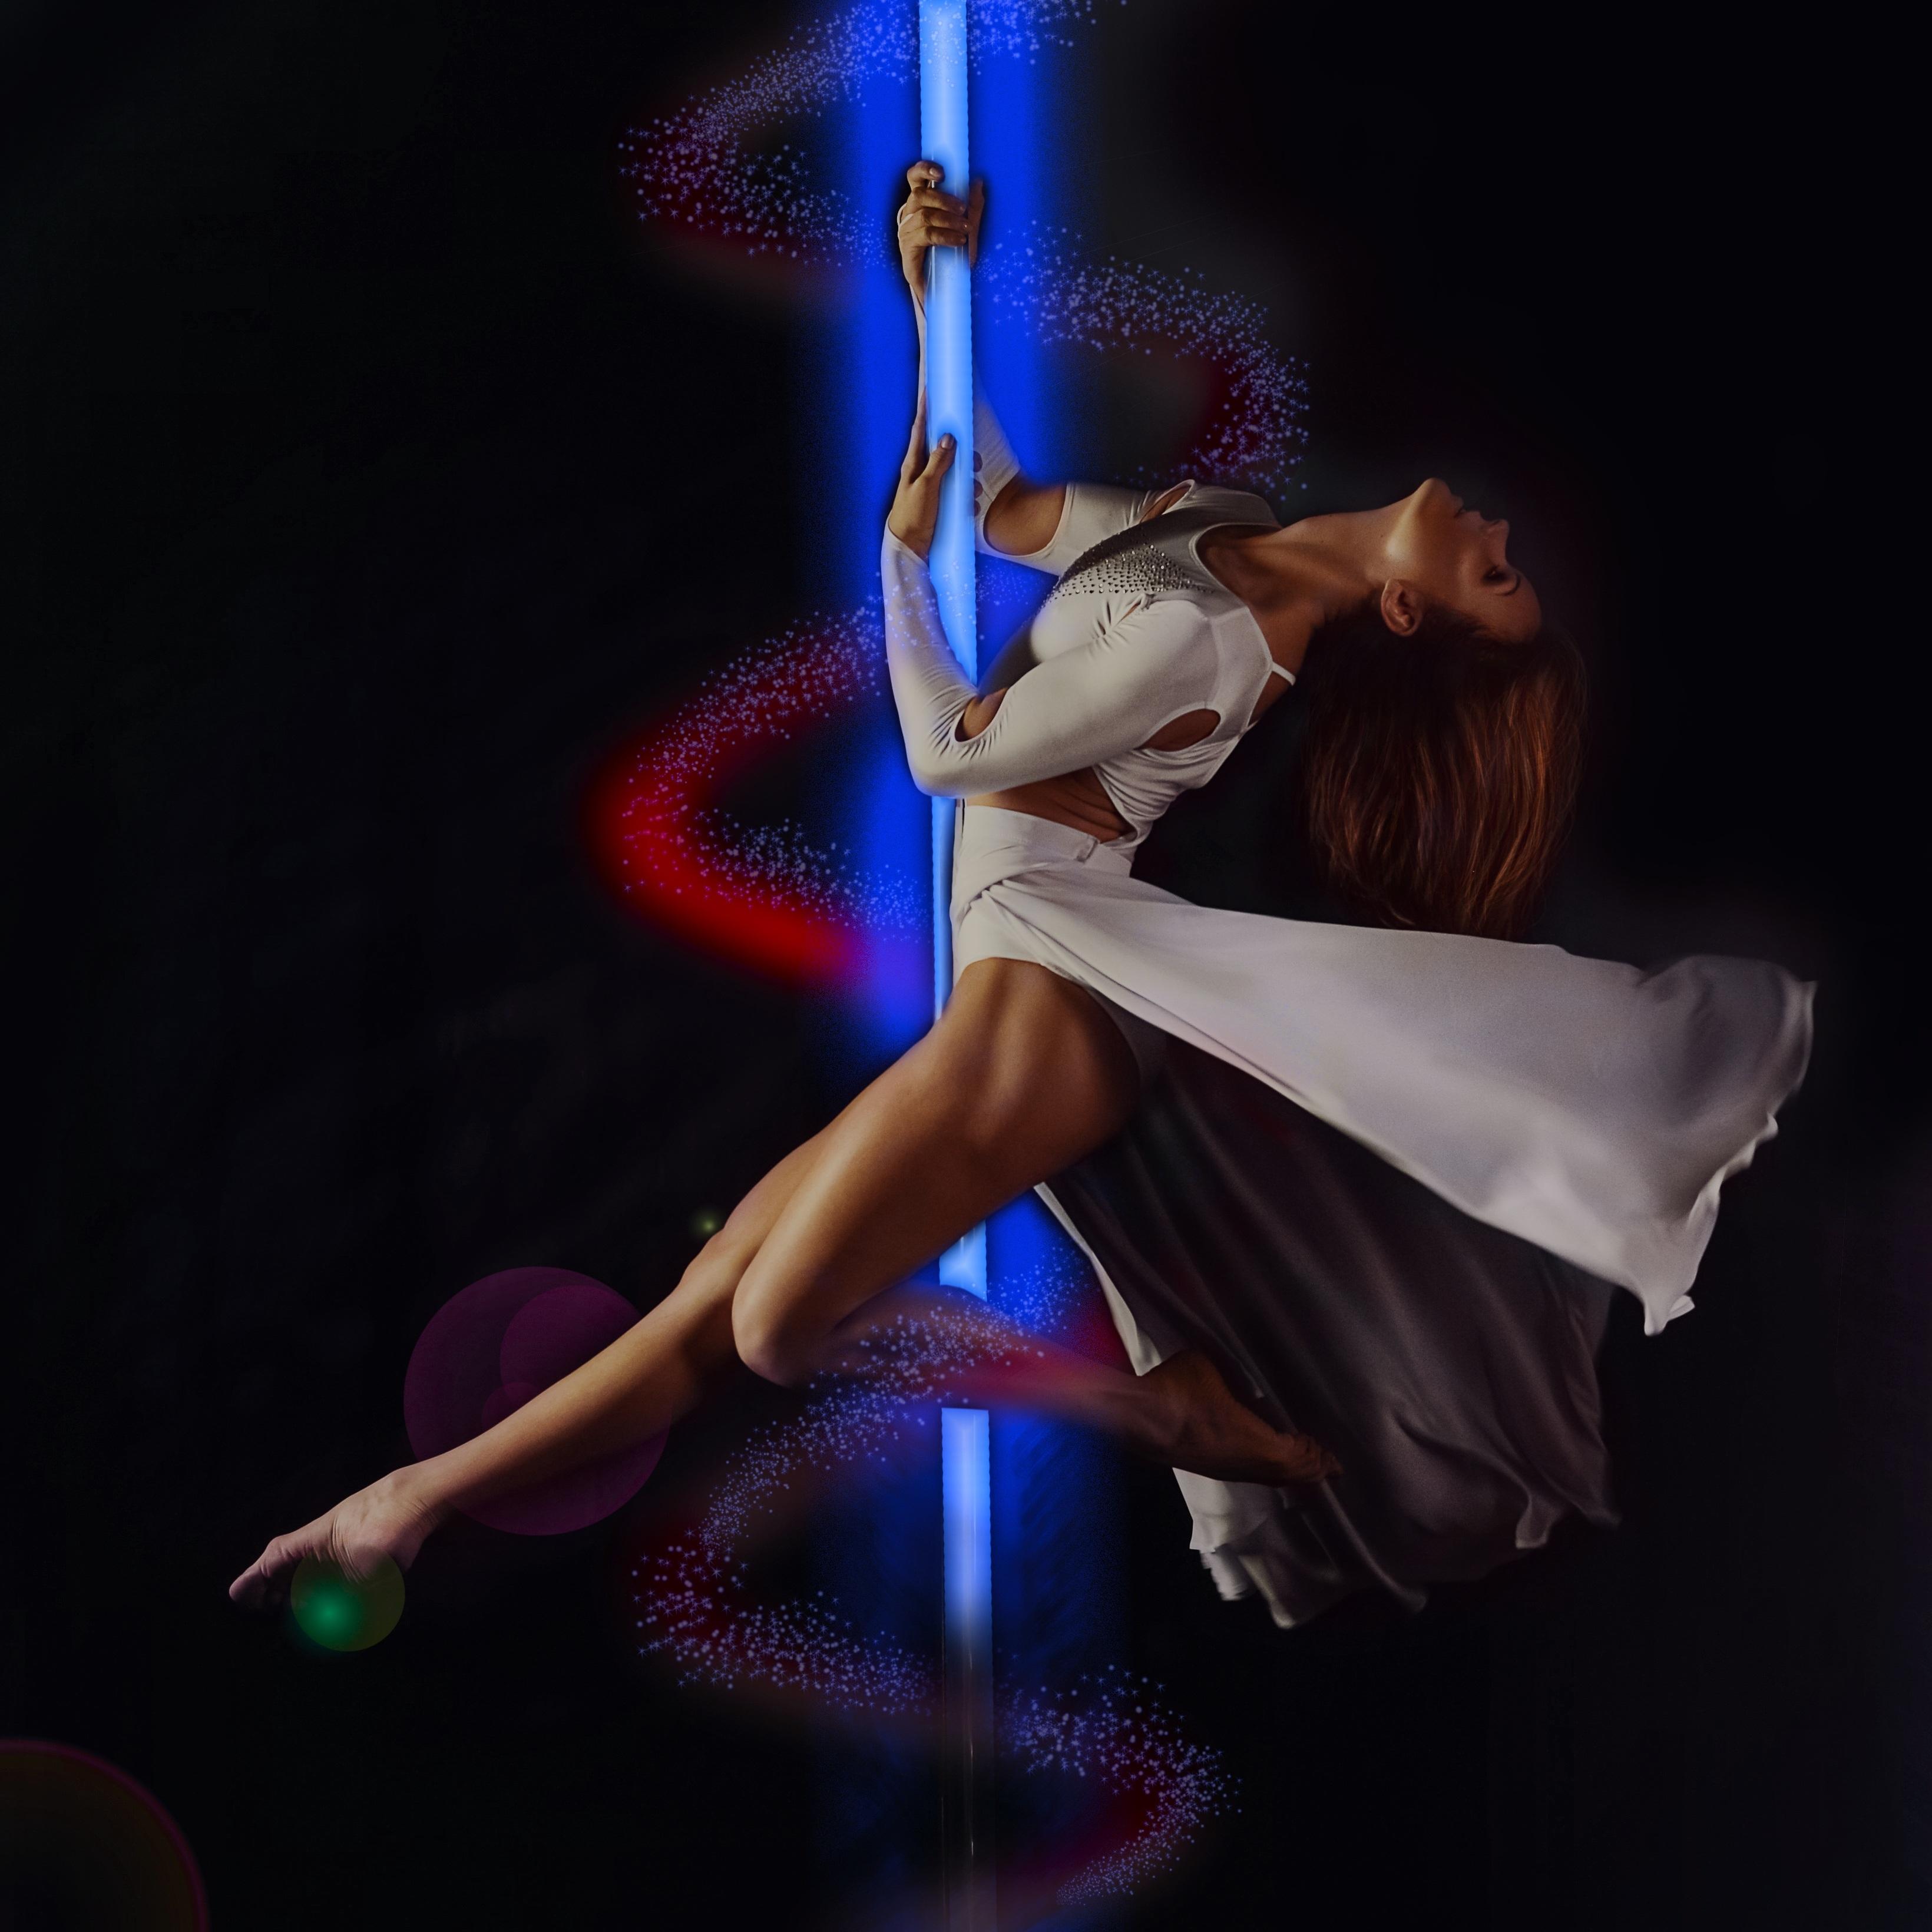 Erotic theatre and dance pics 299